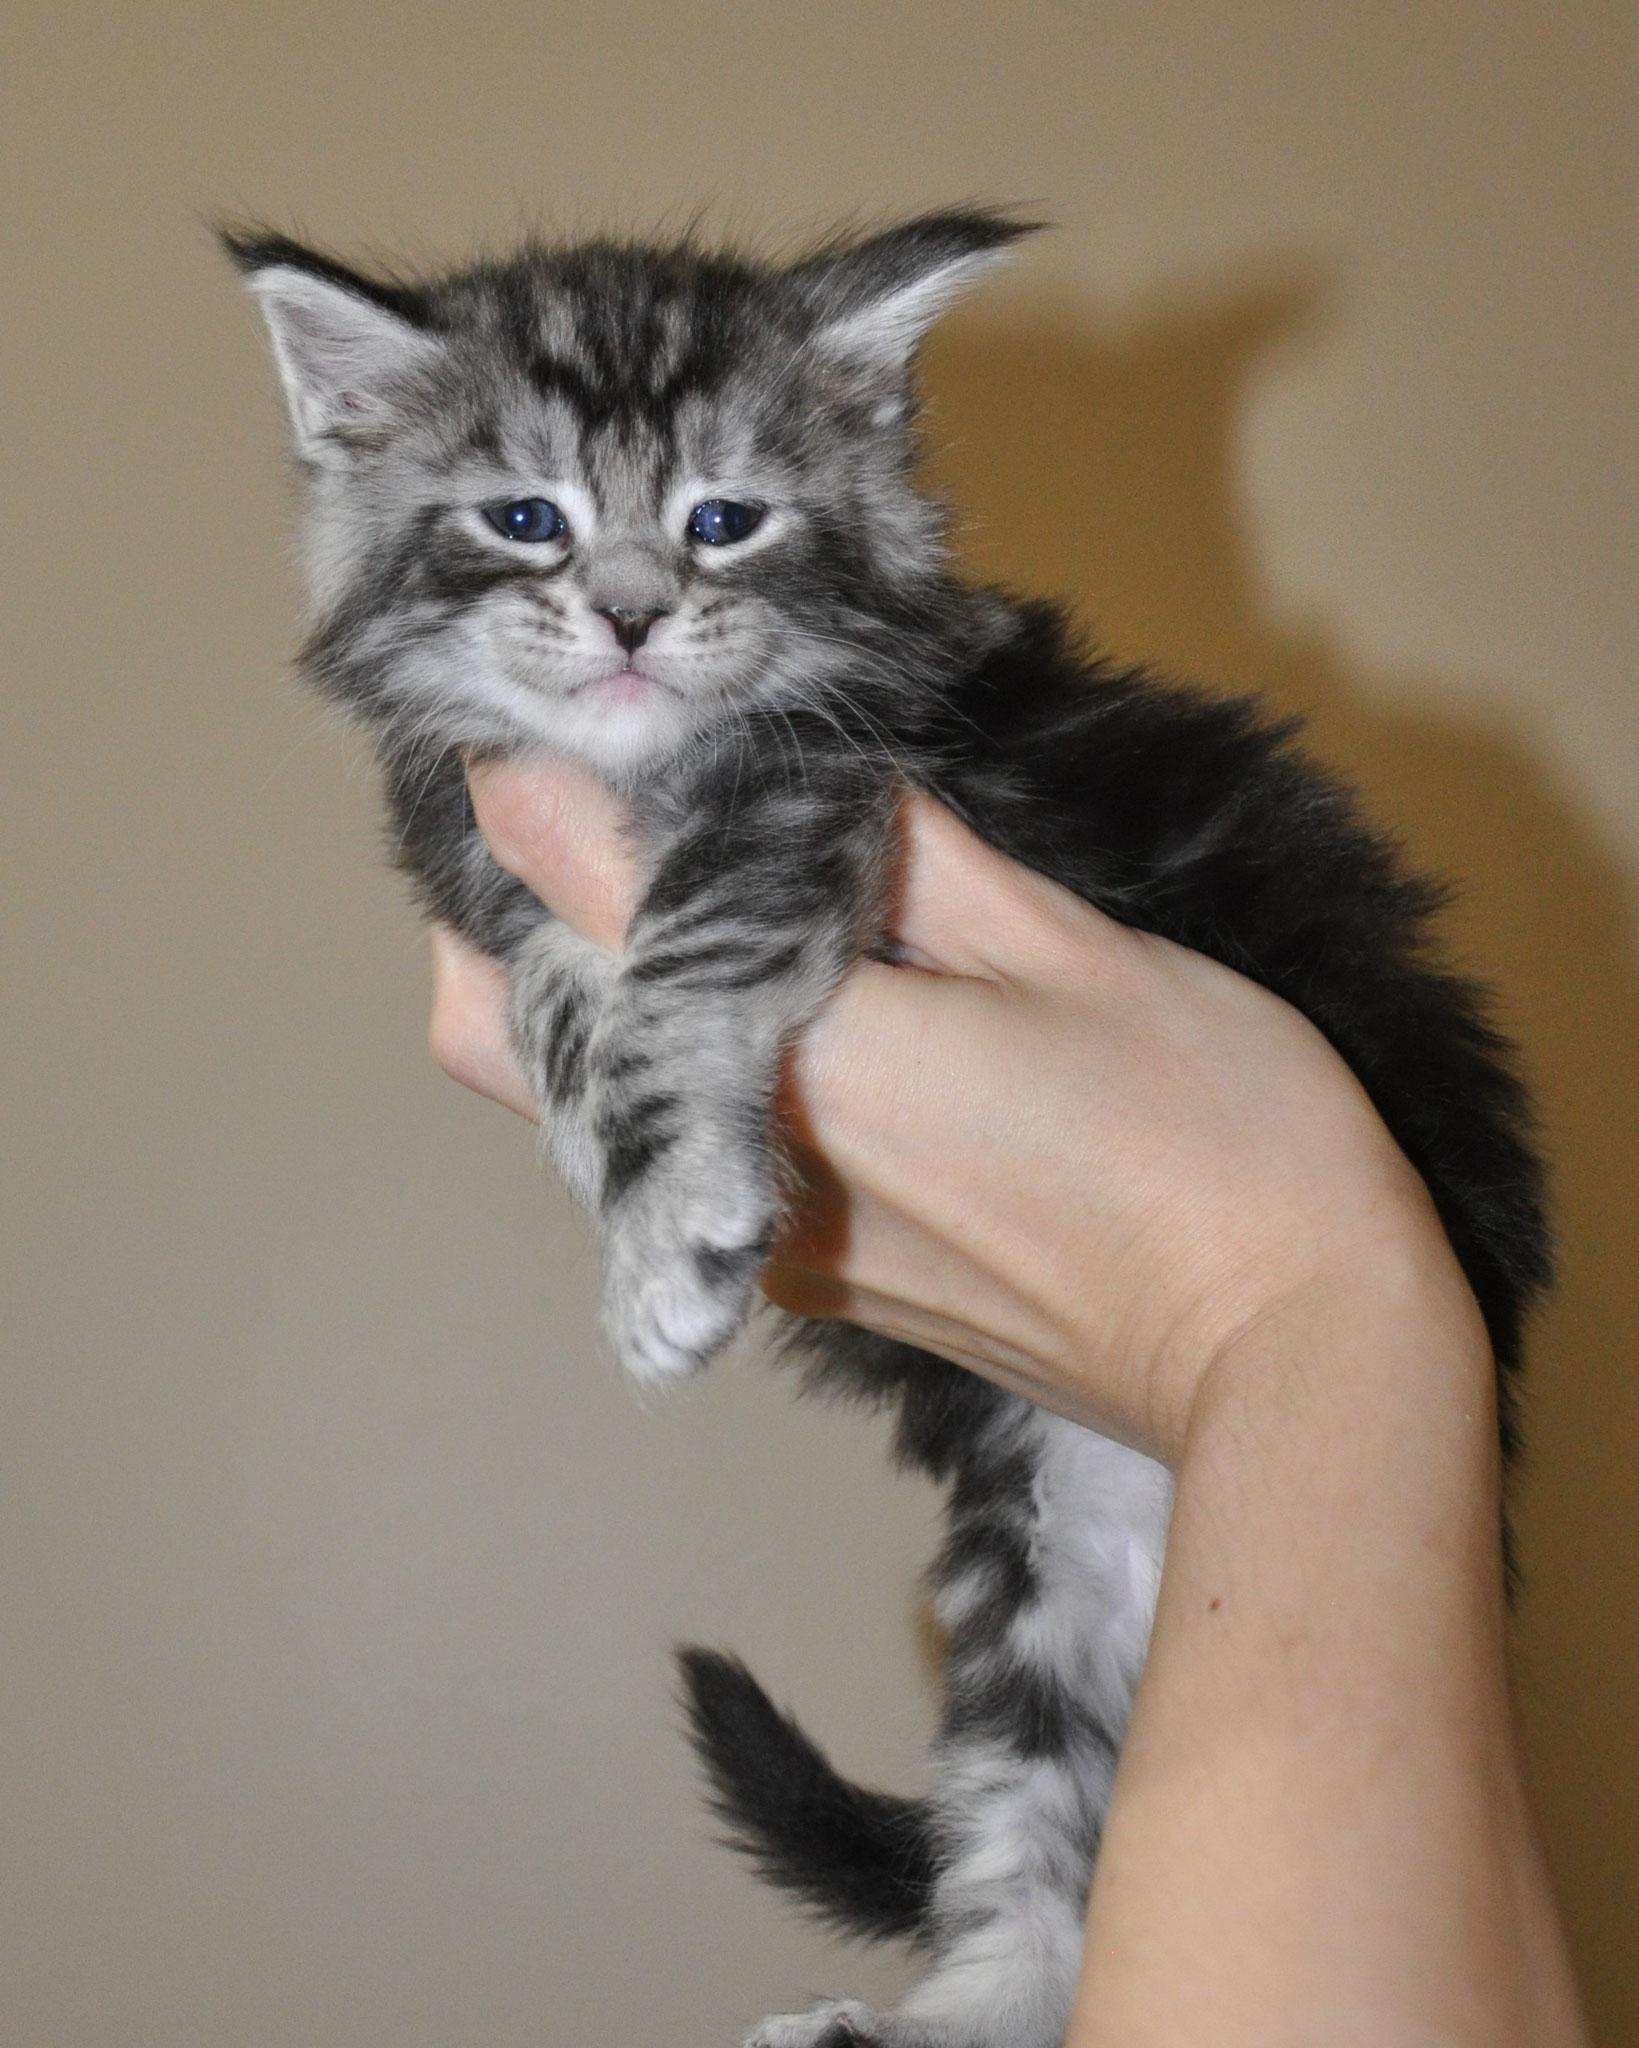 Eva, 4 weeks